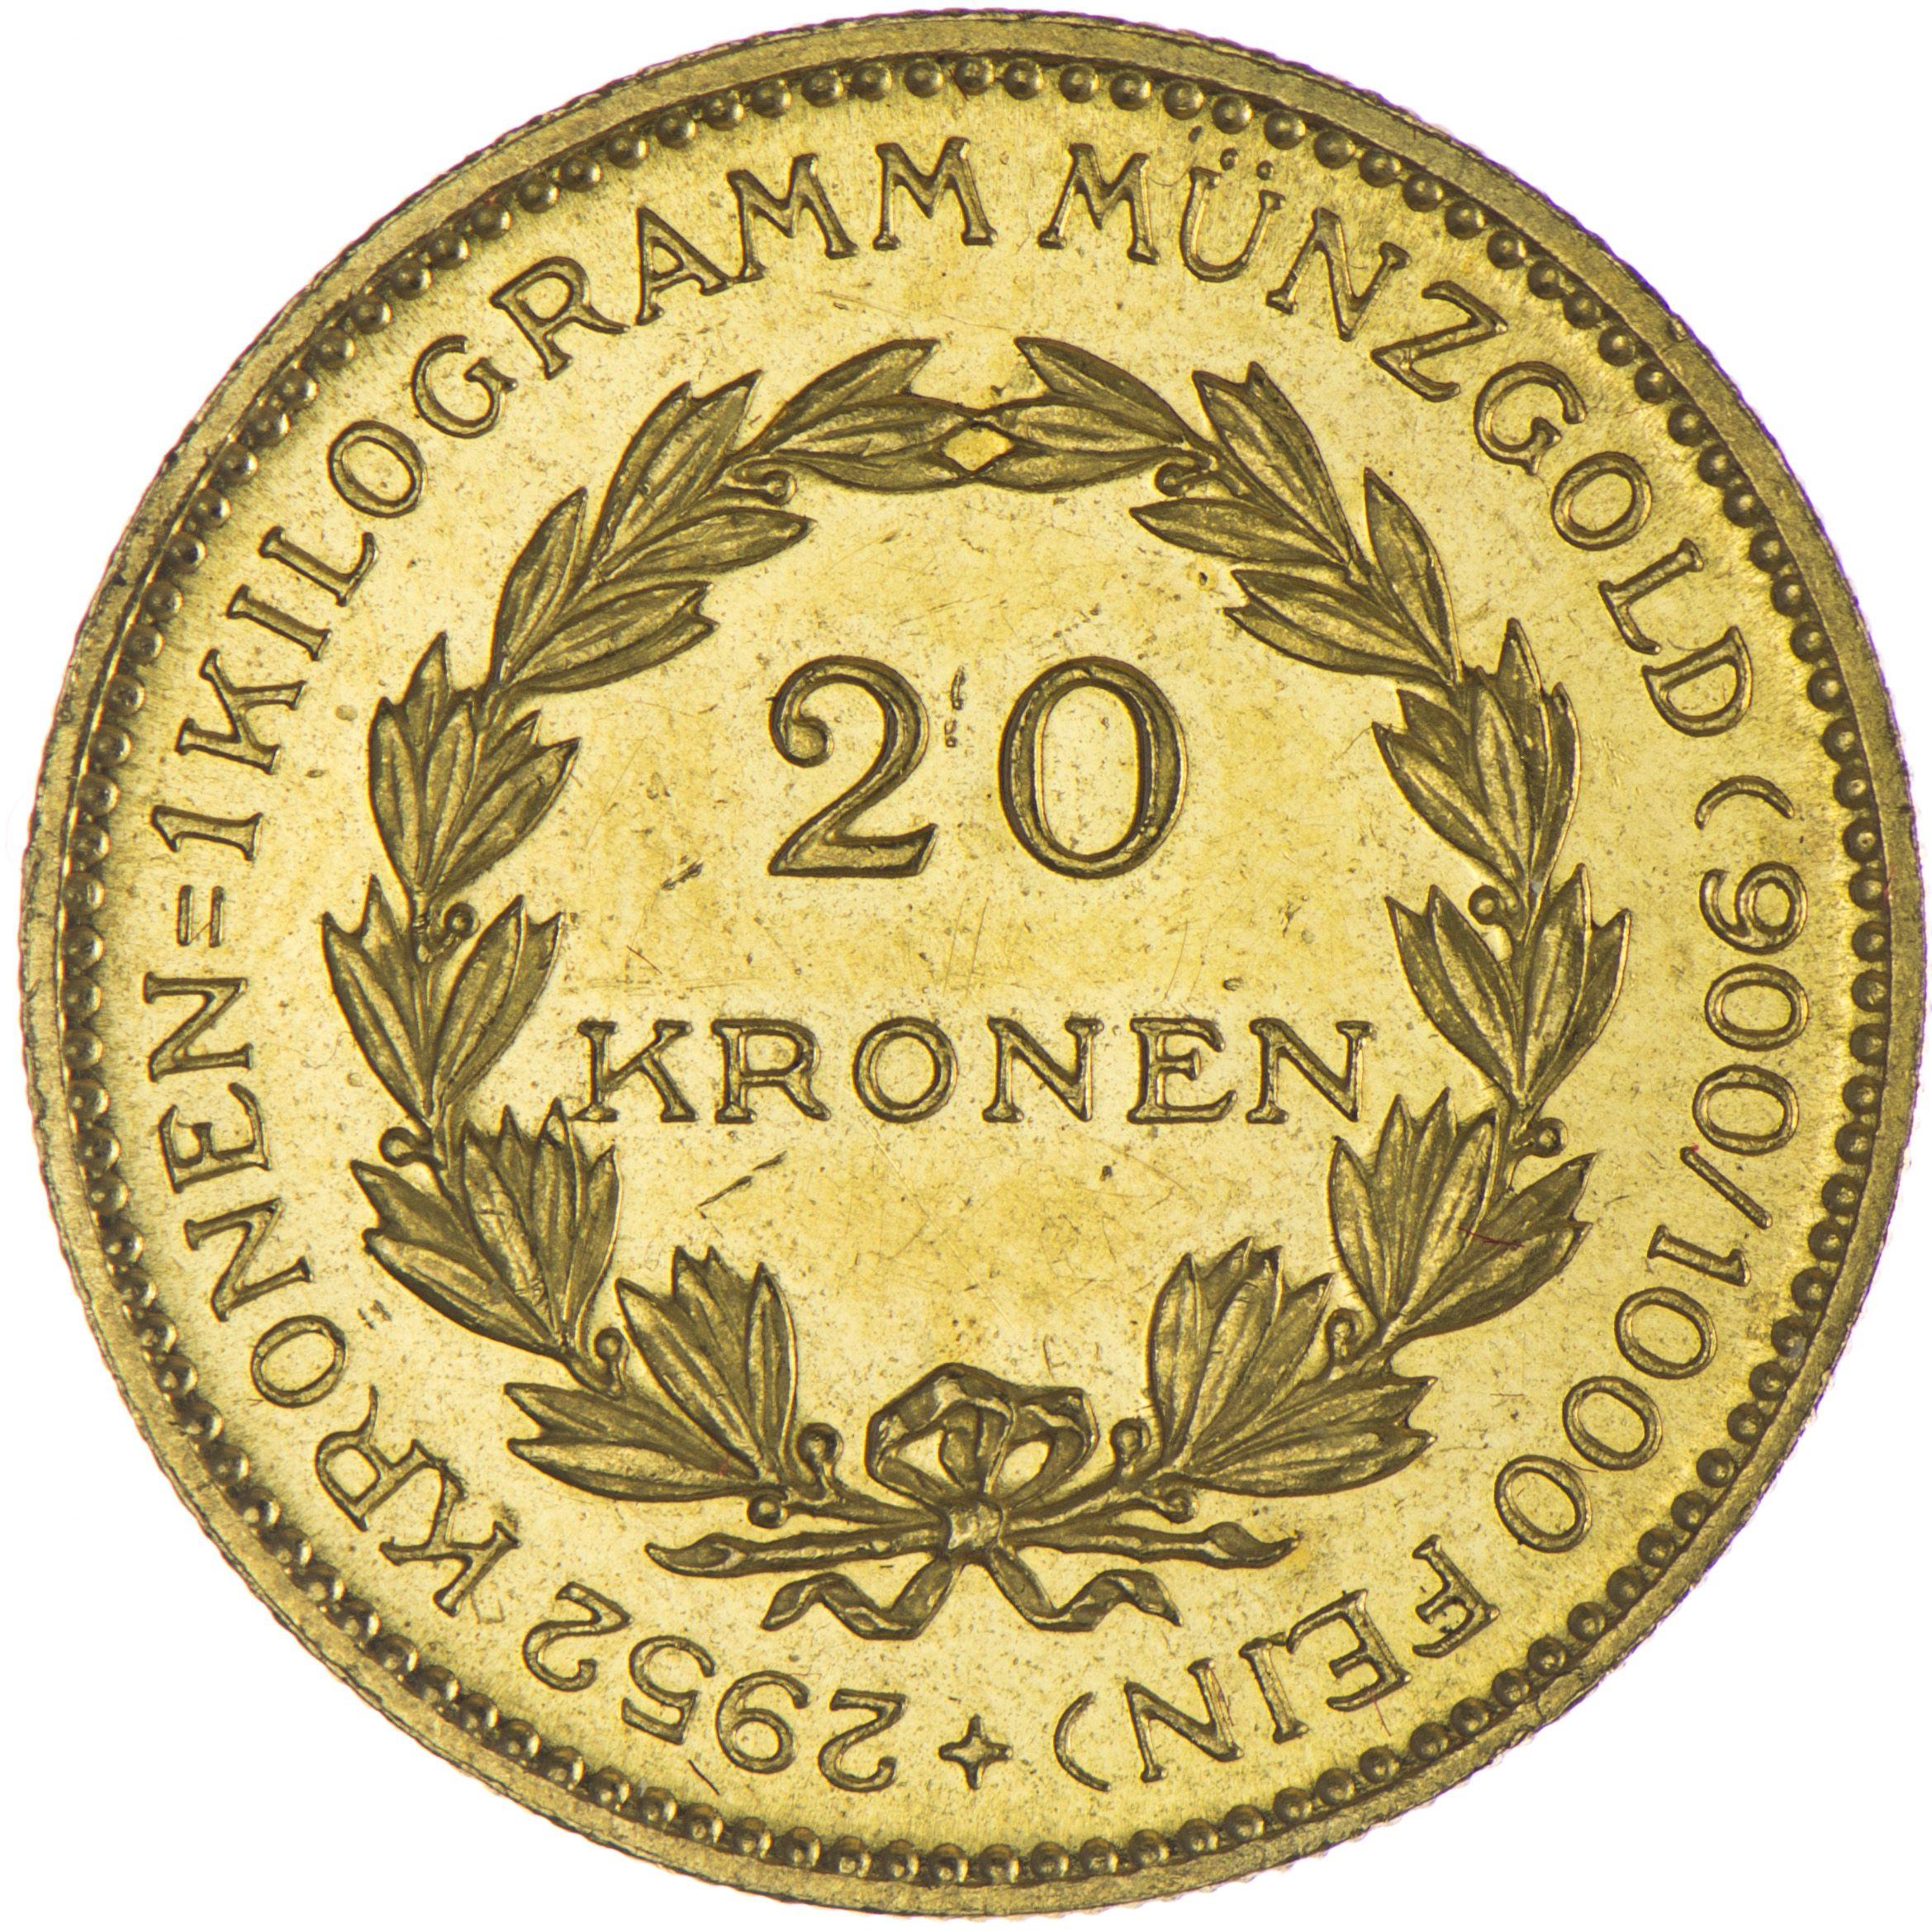 1. Republik-Bundesstaat 1918 - 1938 20 Kronen 1924 Gold, sogenannte Zollkrone